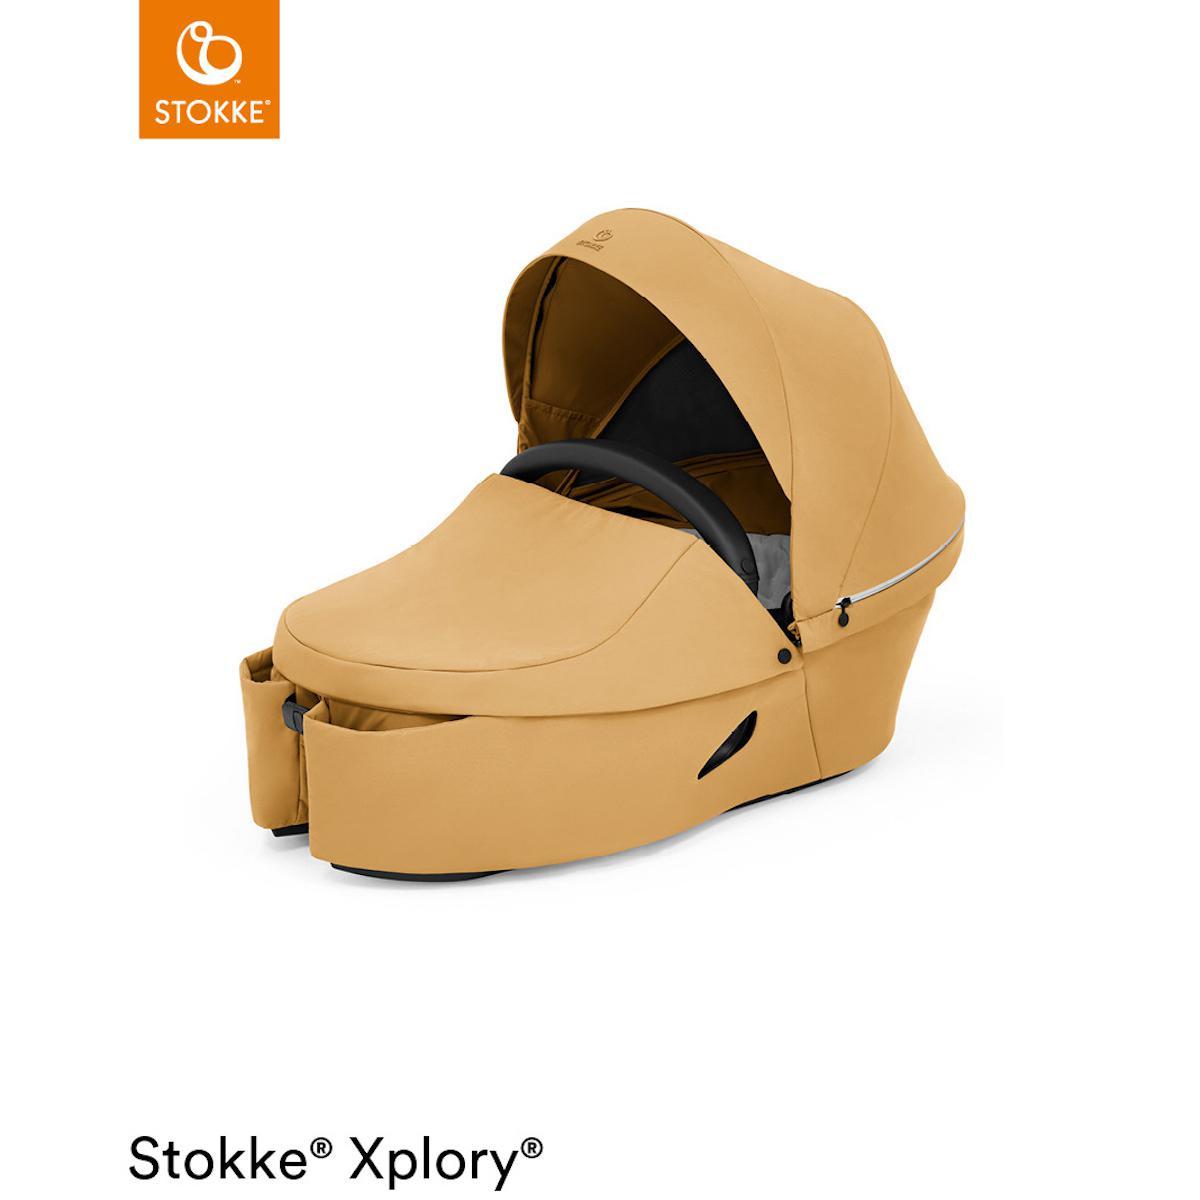 Nacelle XPLORY X Stokke Golden Yellow